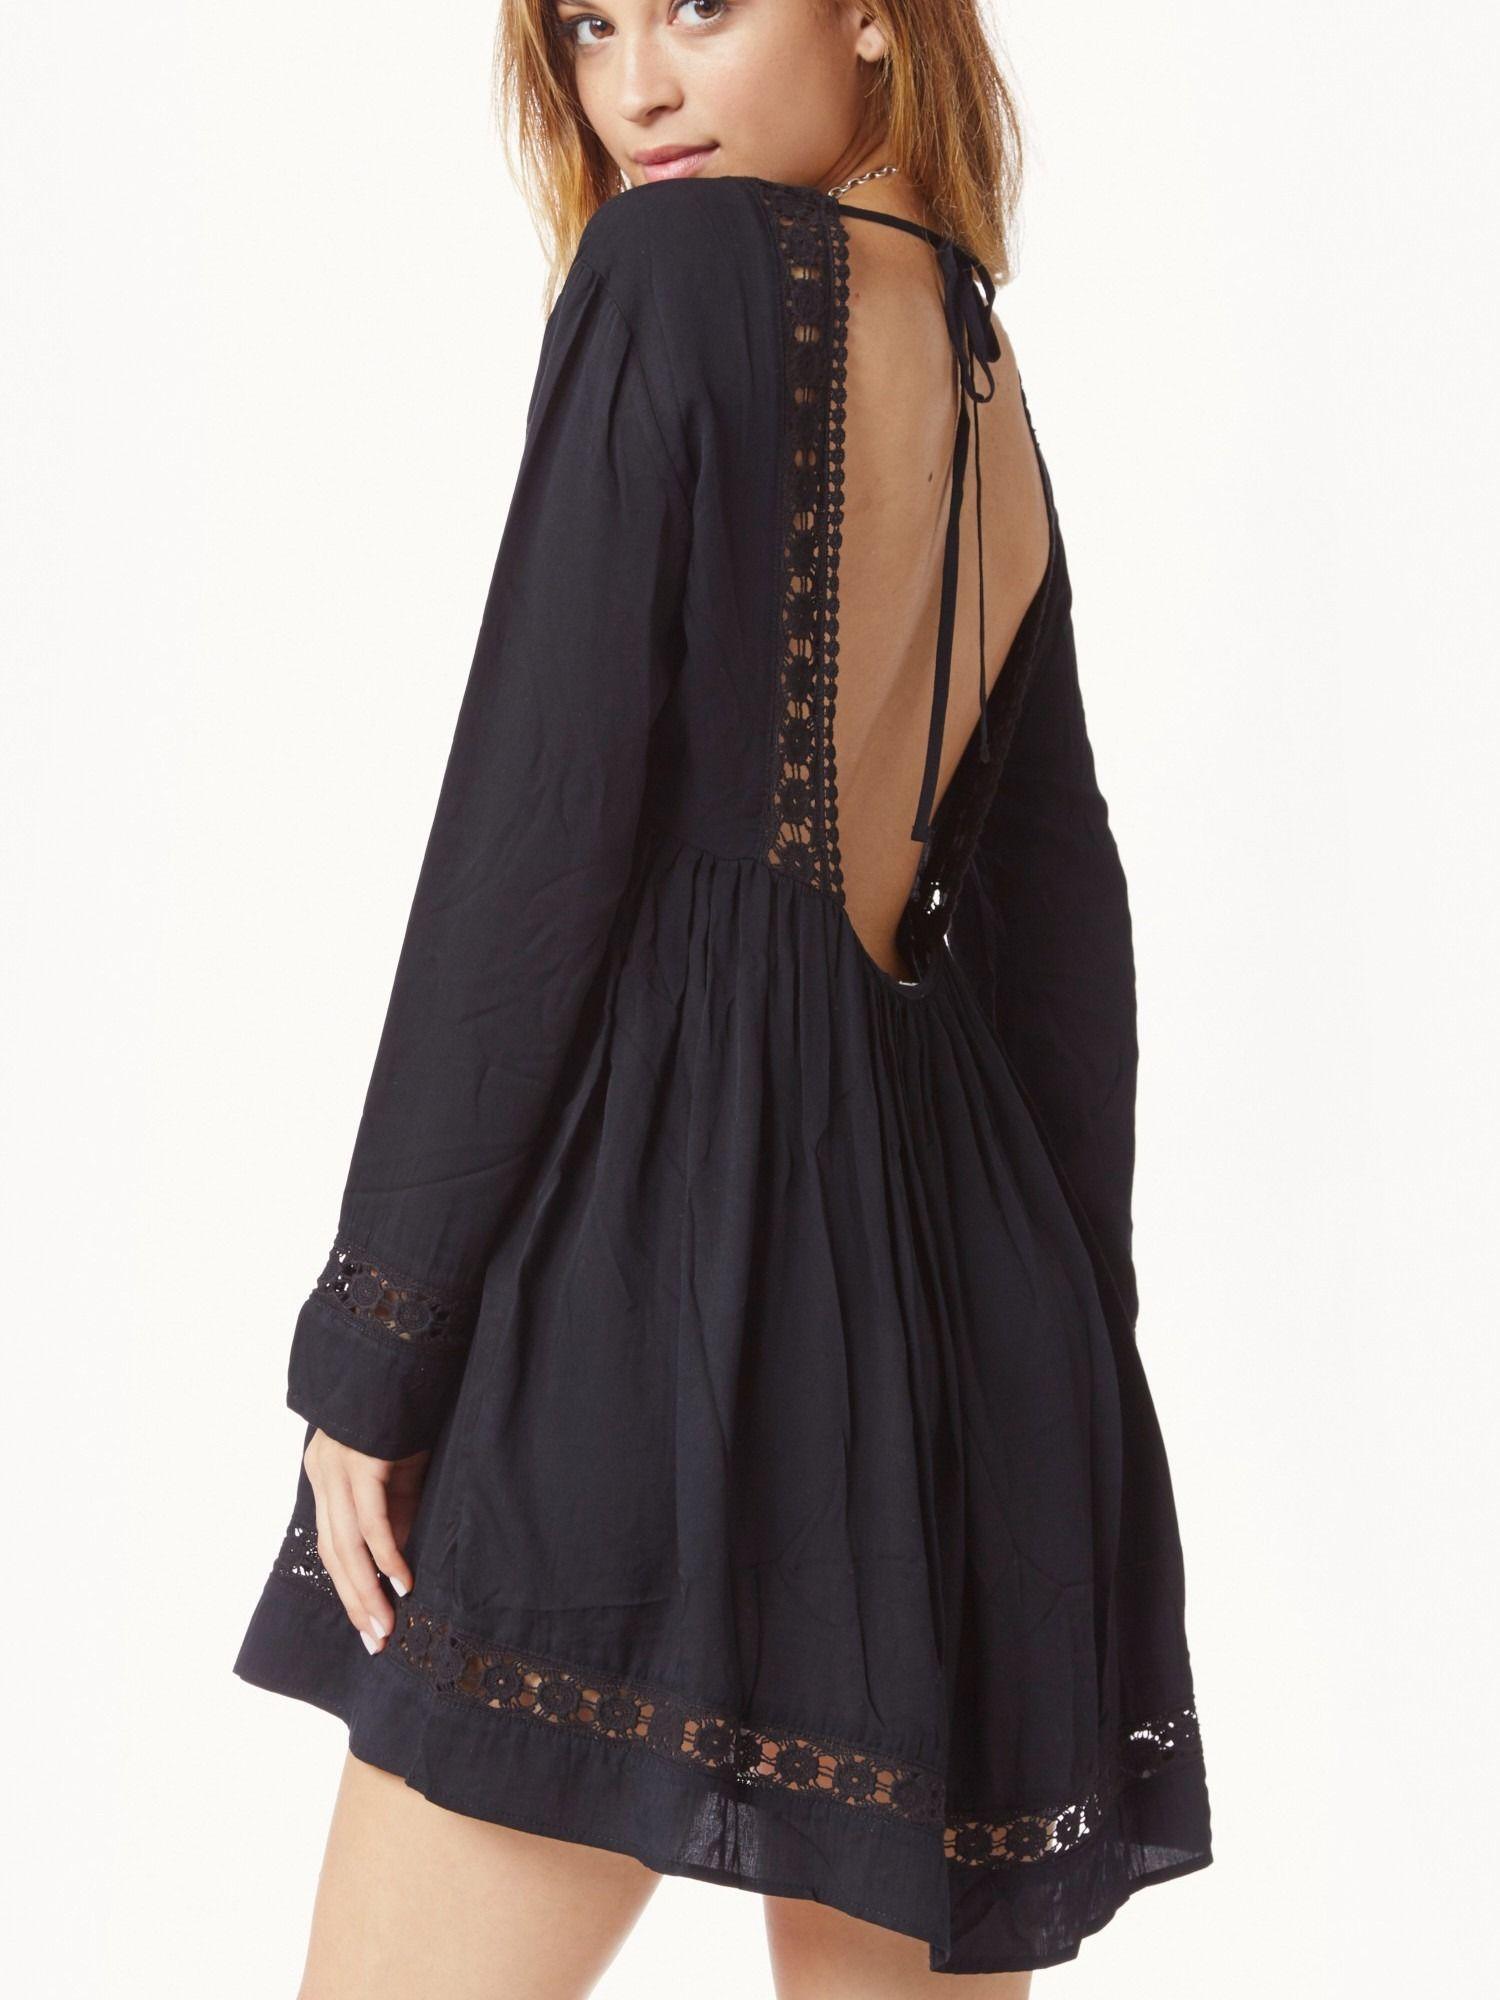 Black long sleeve backless dress black boho dress long